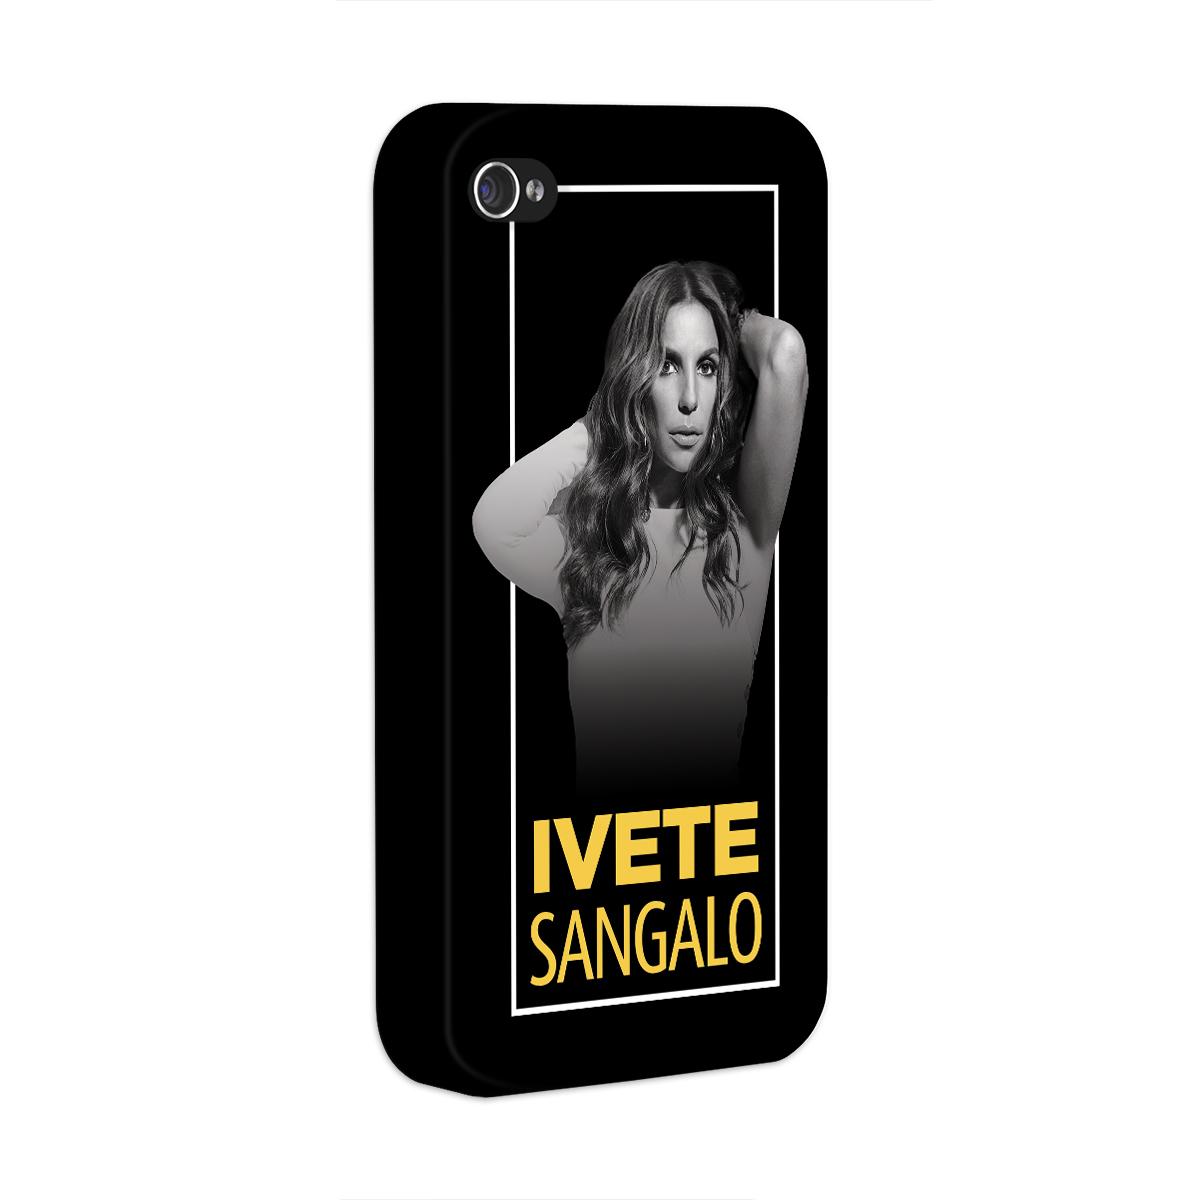 Capa para iPhone 4/4S Ivete Sangalo Beleza